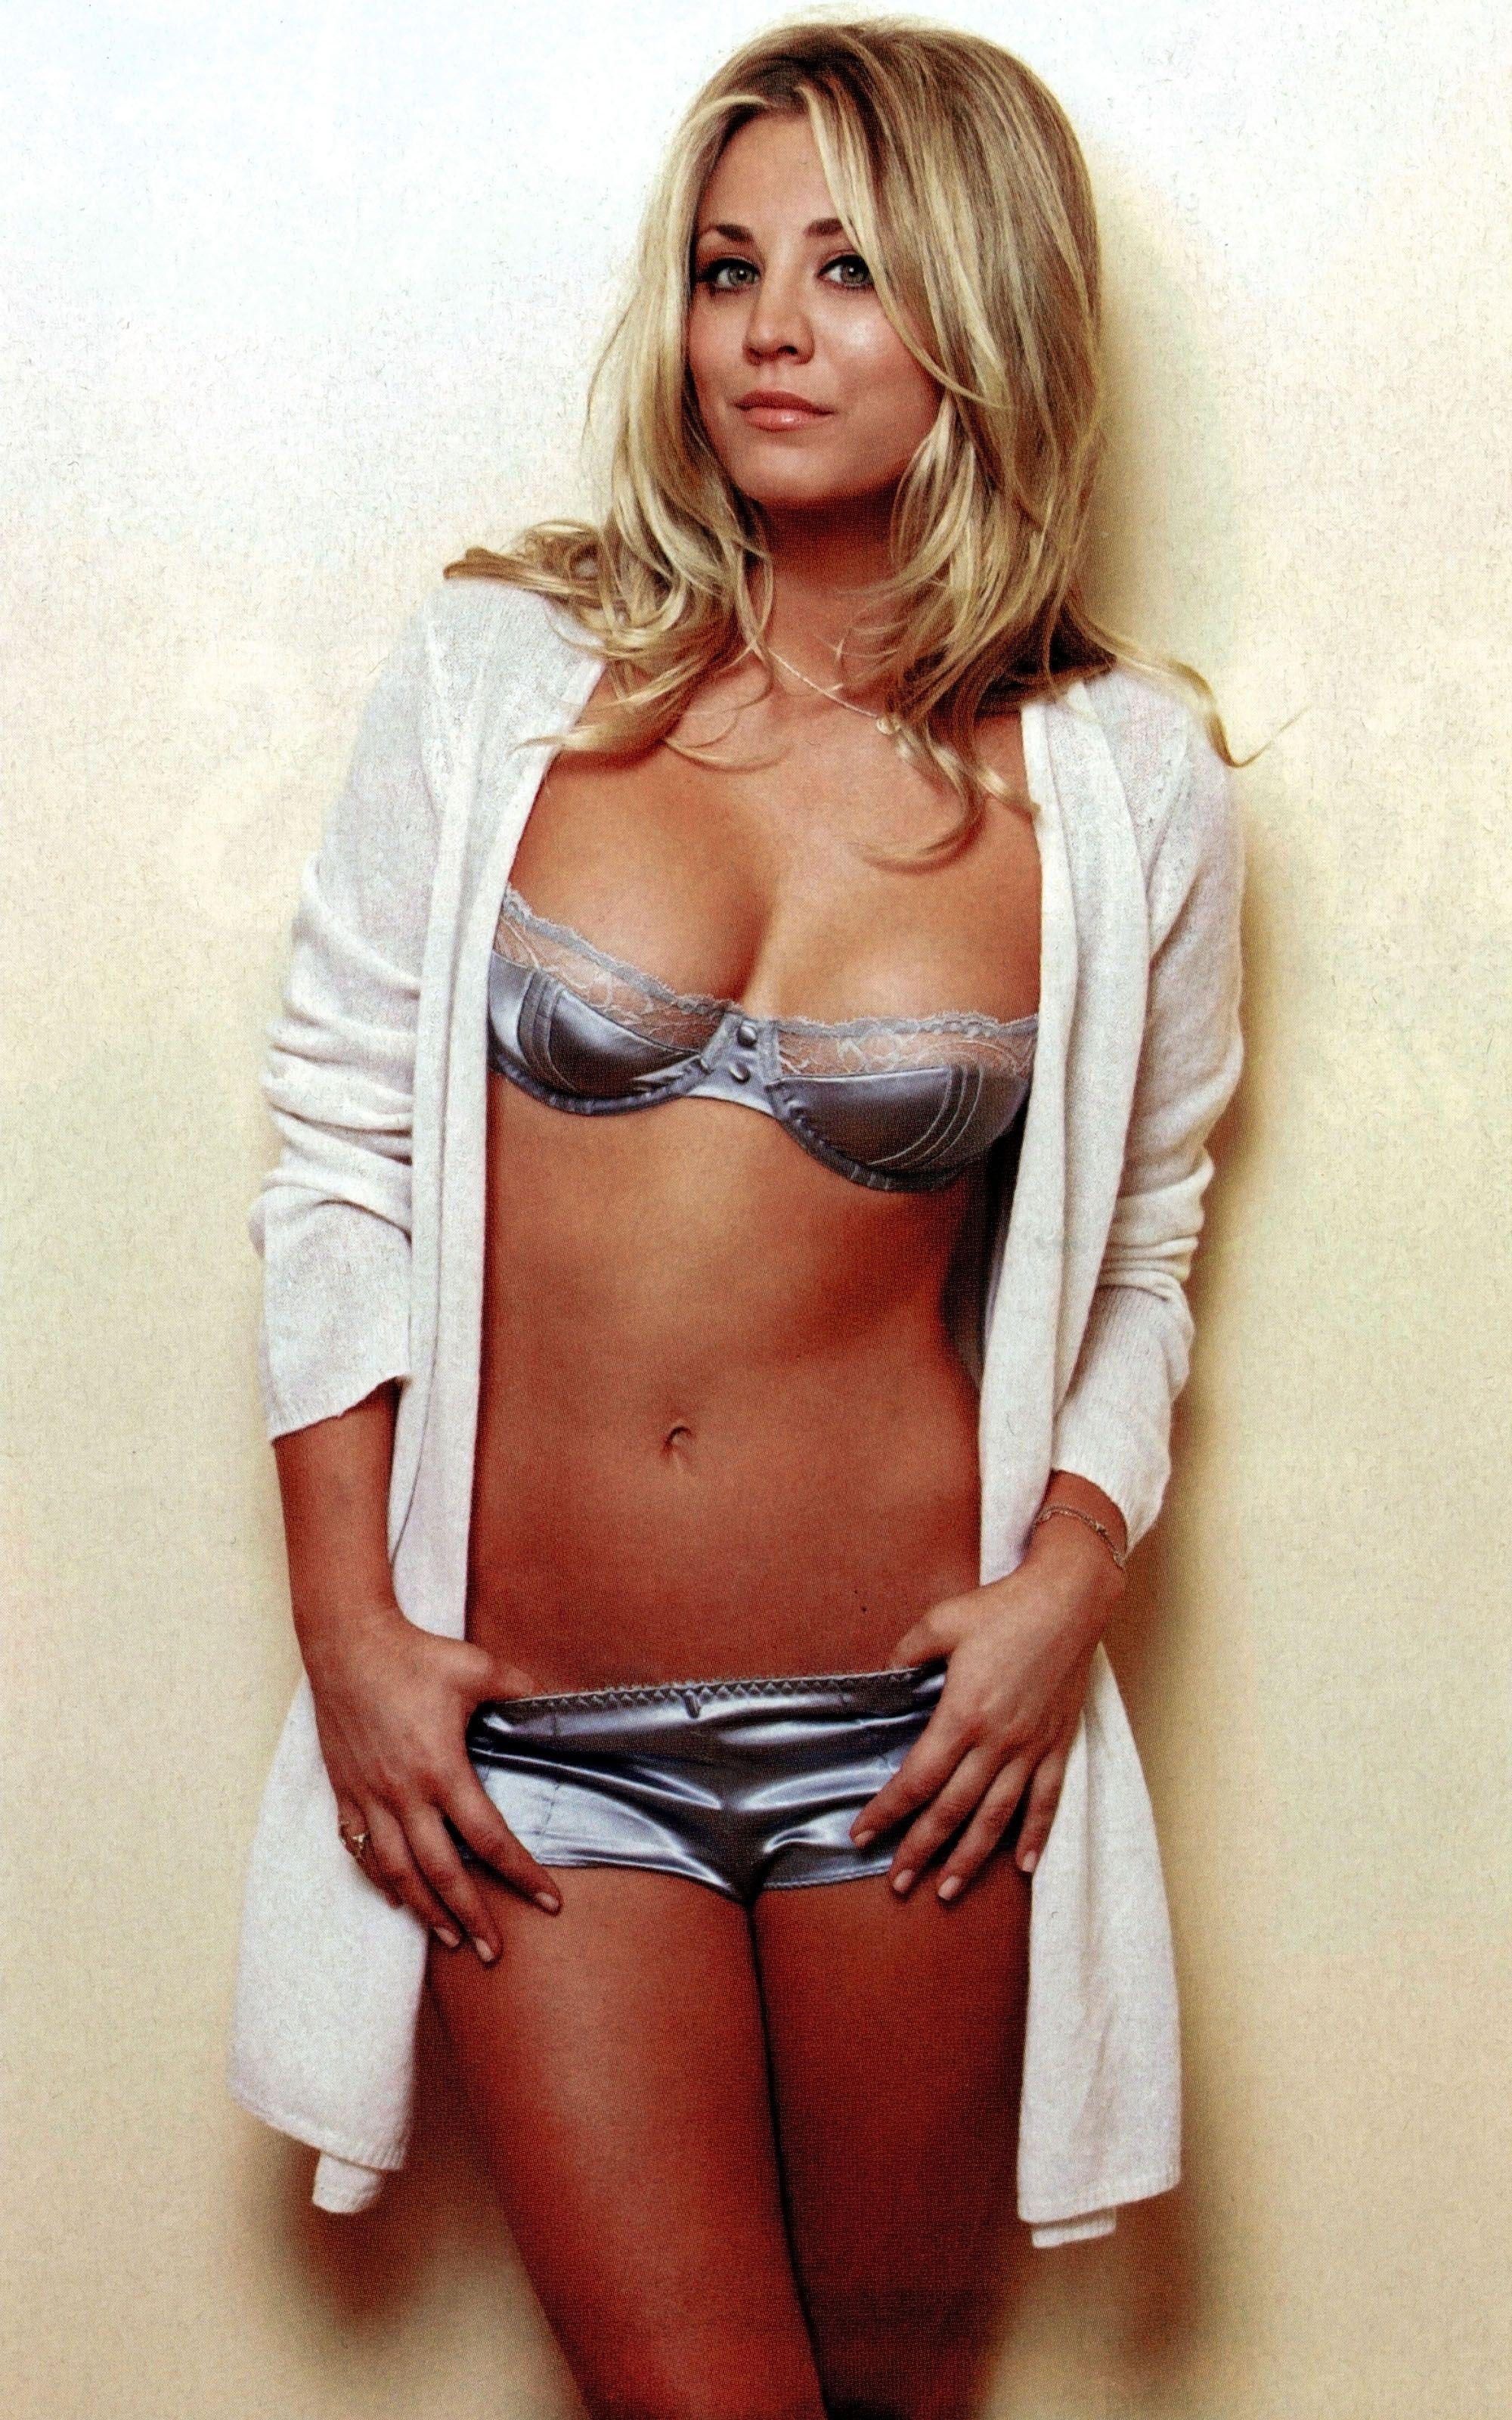 Leaked Tami Donaldson nude (14 photo), Topless, Bikini, Boobs, butt 2015